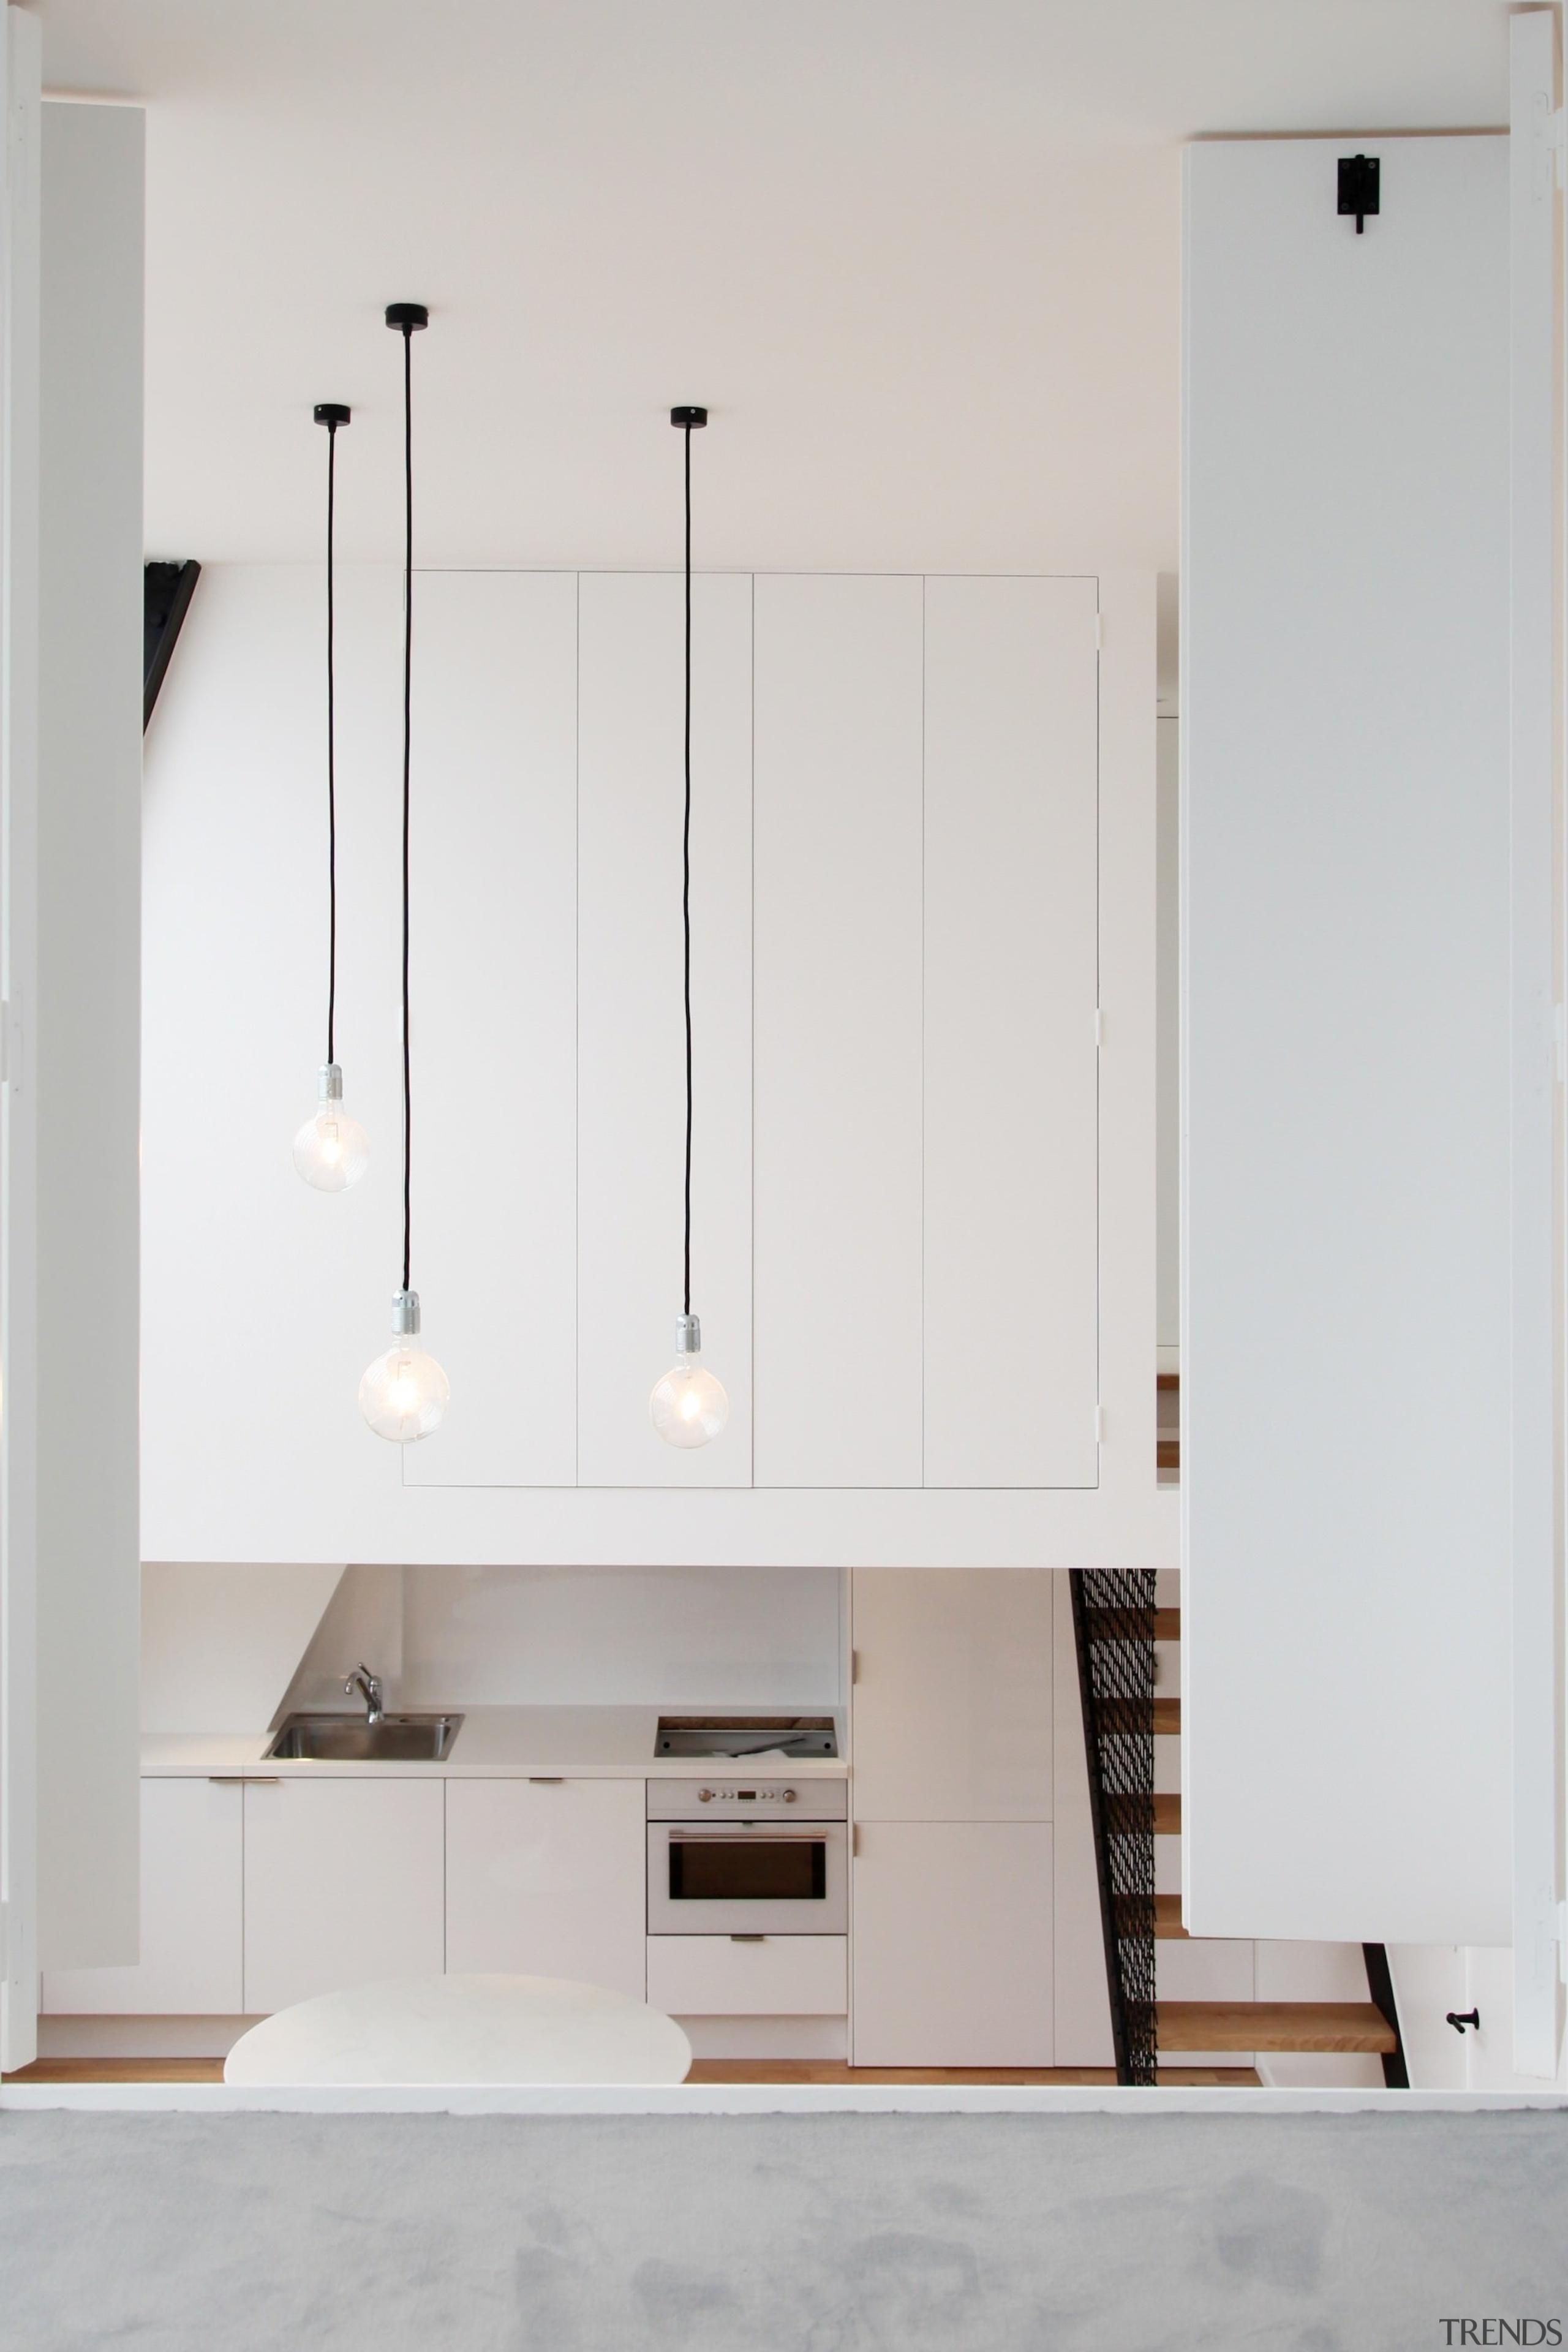 Architect: jbmn architectesPhotographer: Hermann Wendler furniture, interior design, product, product design, gray, white